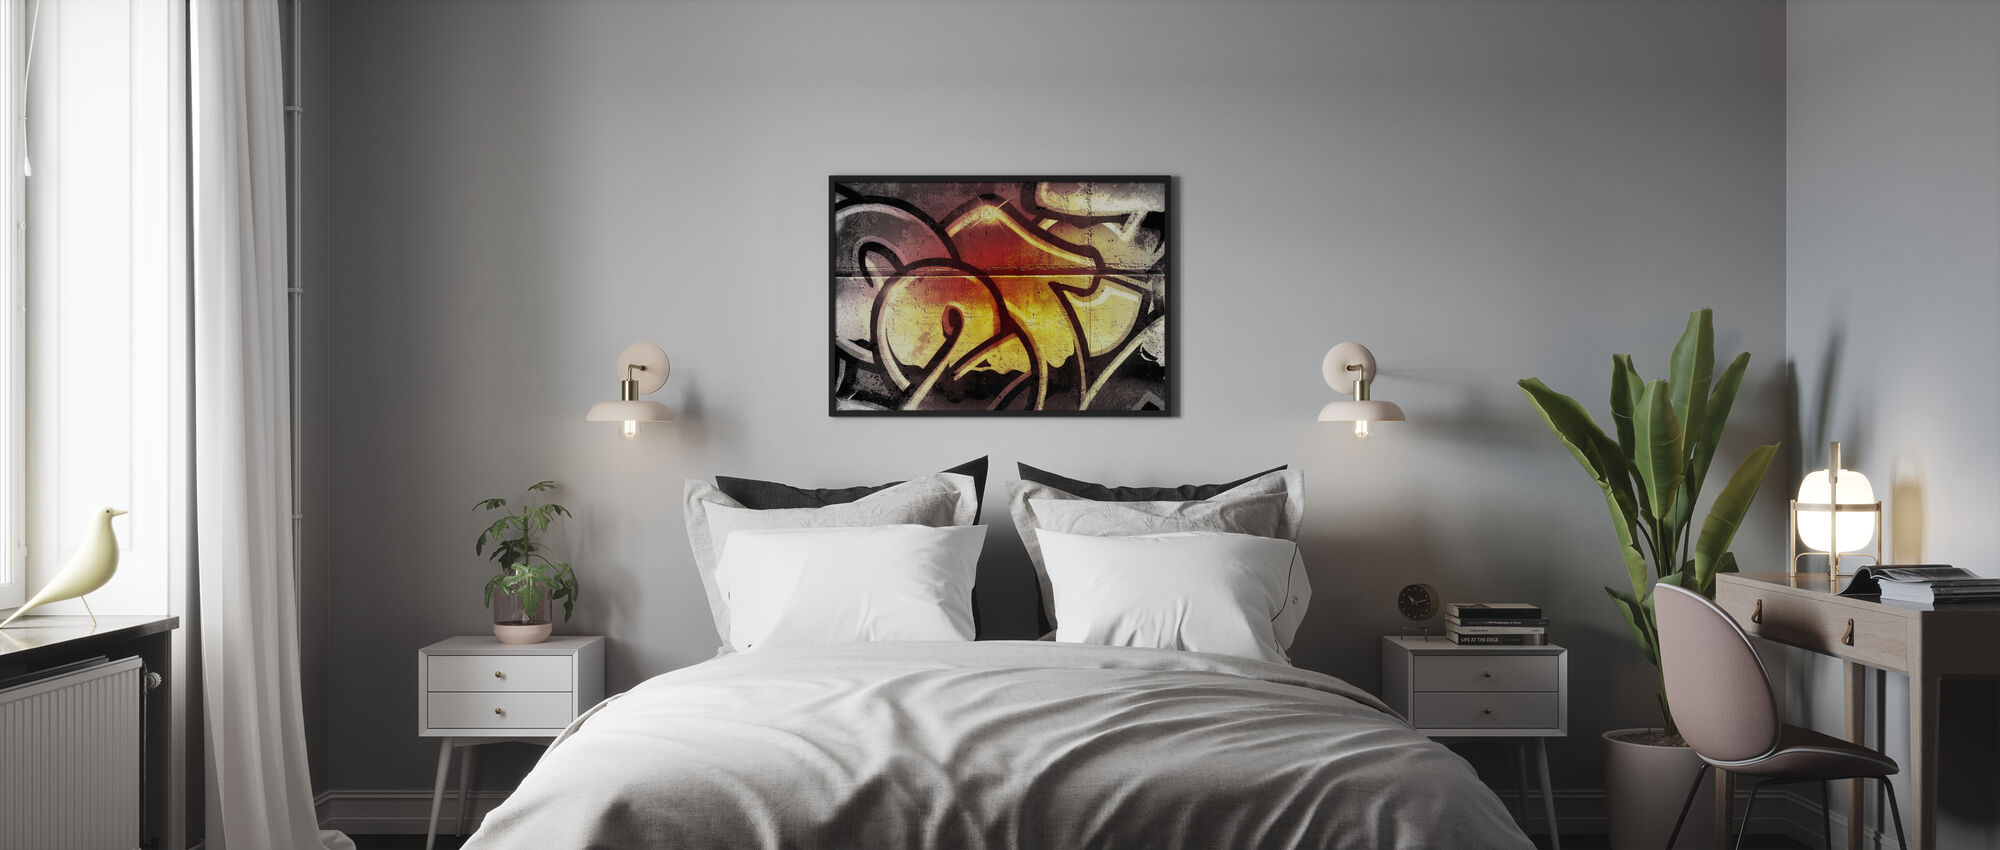 Gouden Graffiti - Ingelijste print - Slaapkamer